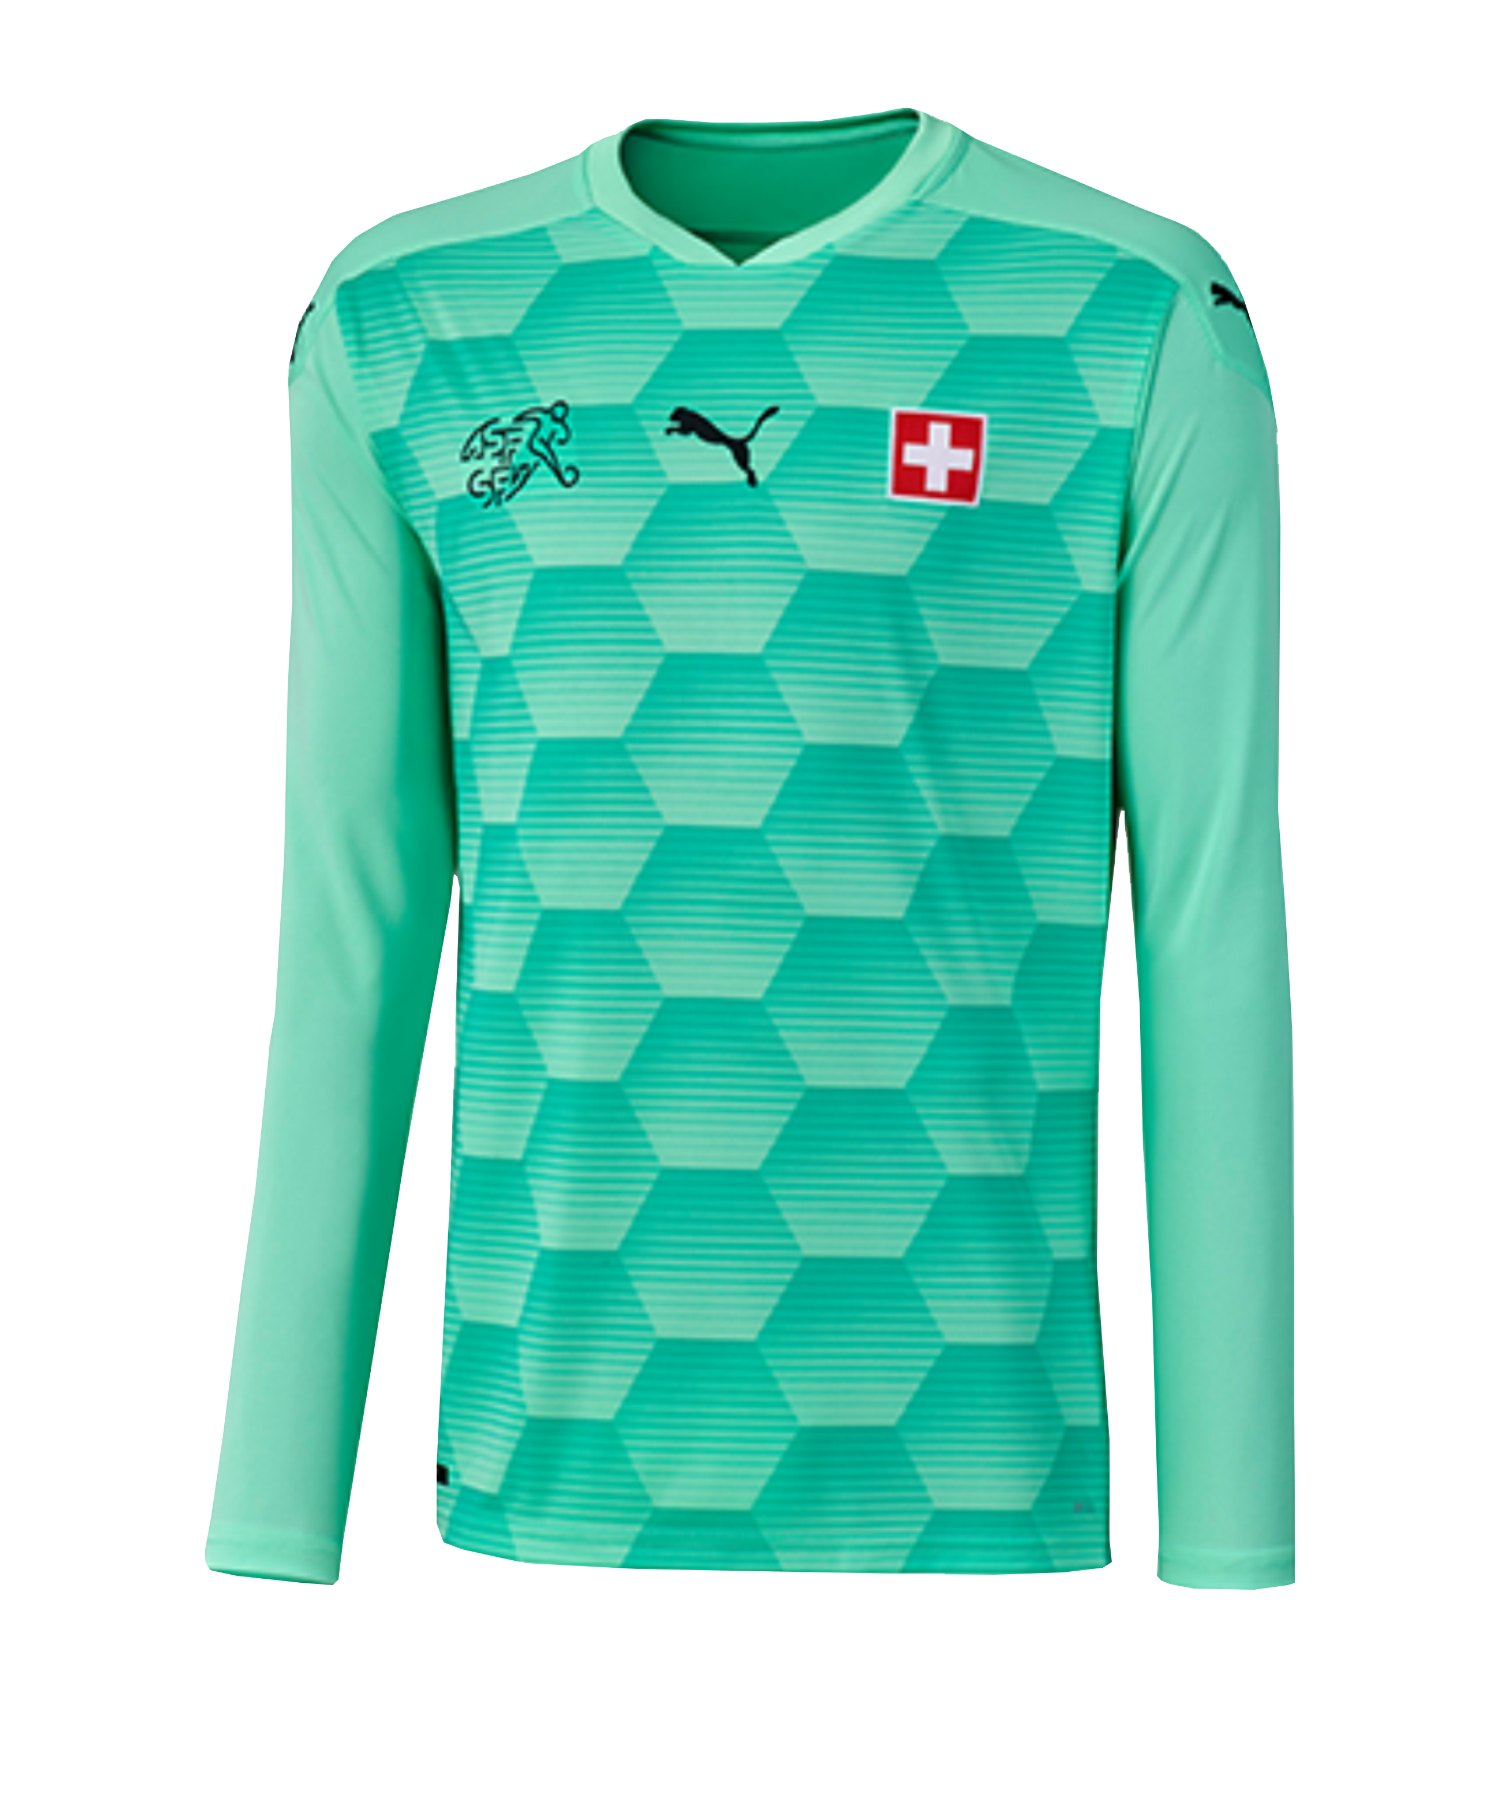 PUMA Schweiz Torwarttrikot EM 2020 Kids Grün F04 - grün